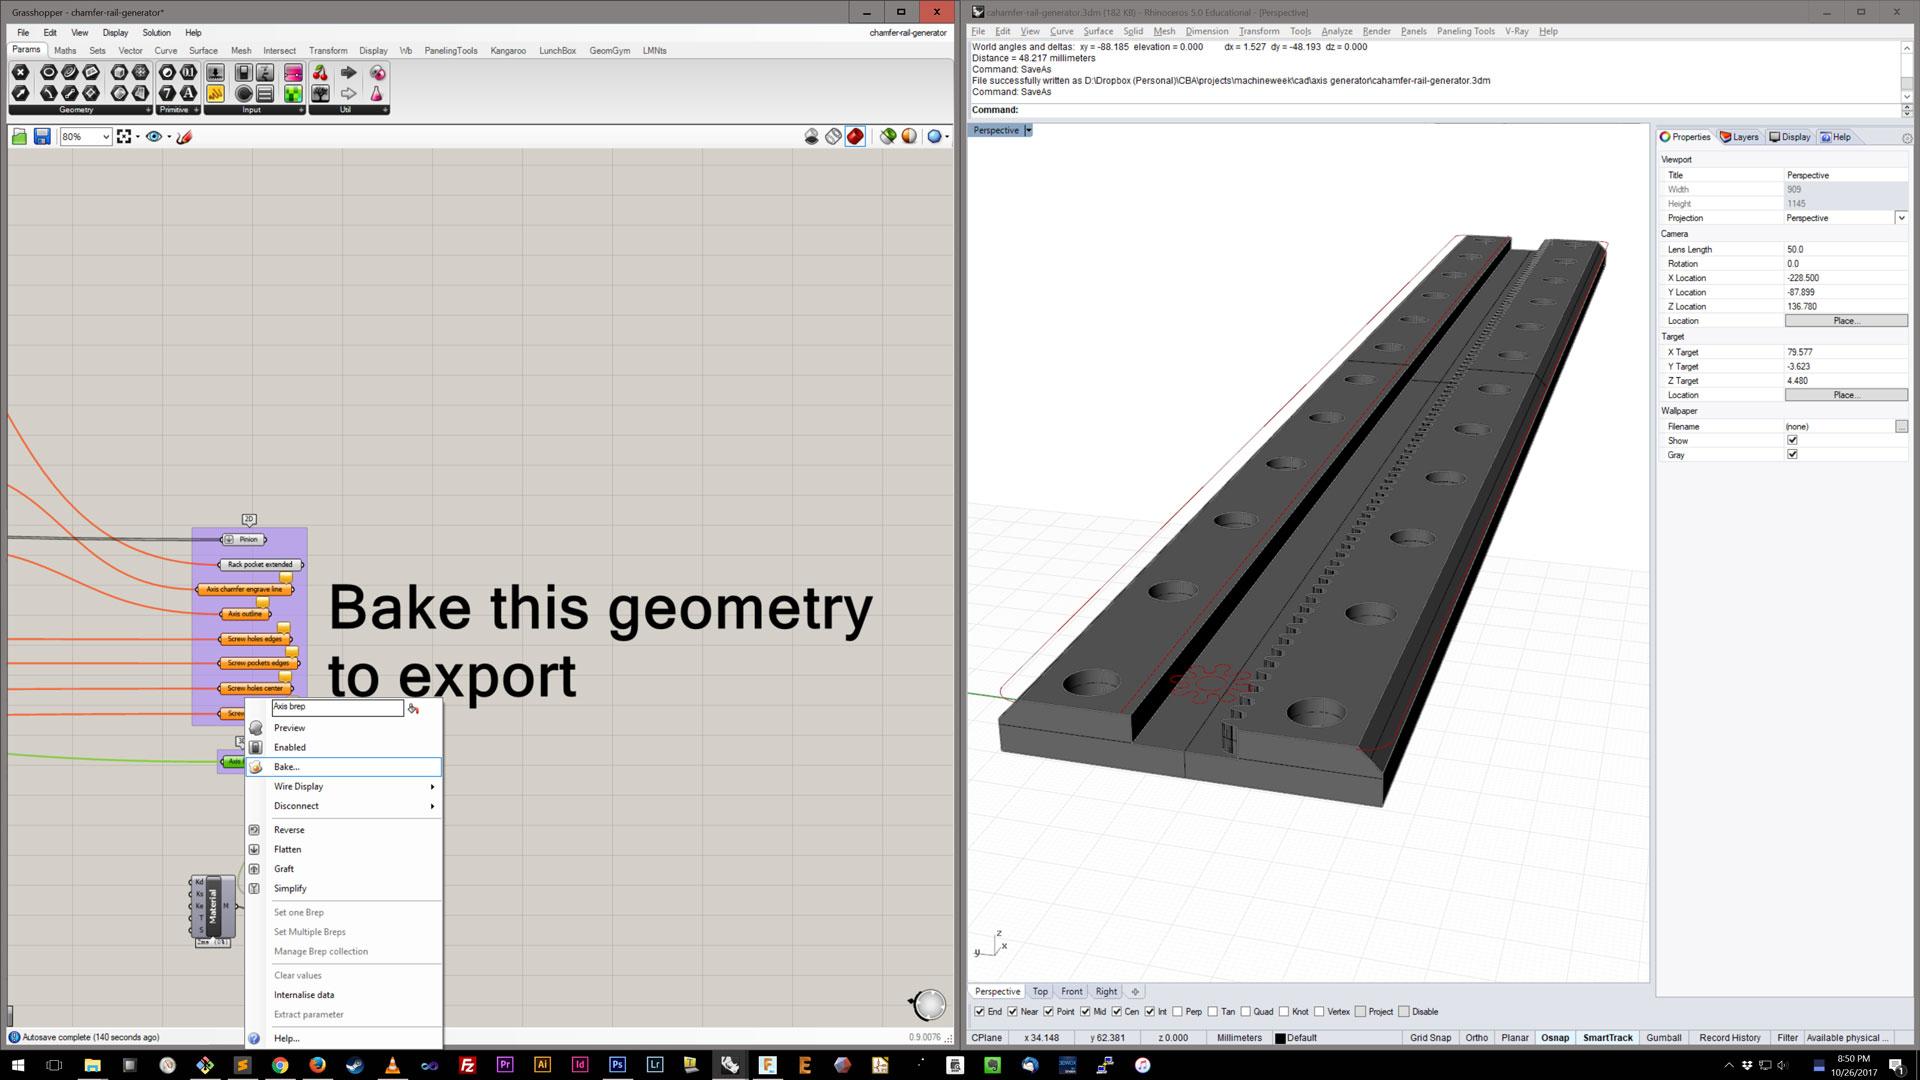 images/generate-x-axis-bake.jpg